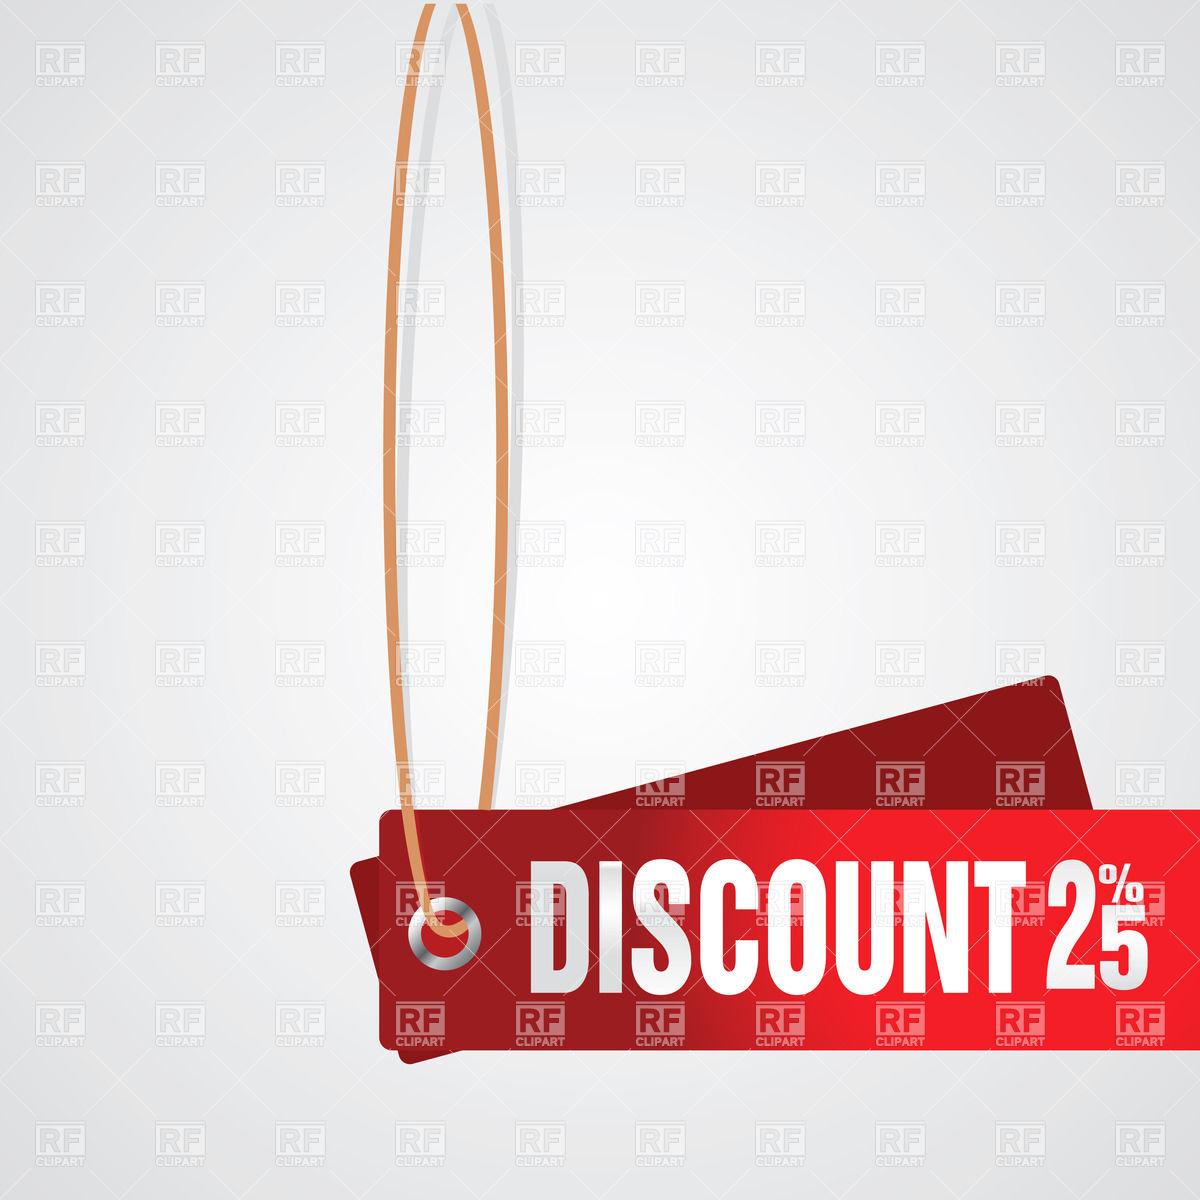 1200x1200 Discount 25% Coupon Vector Image Vector Artwork Of Design